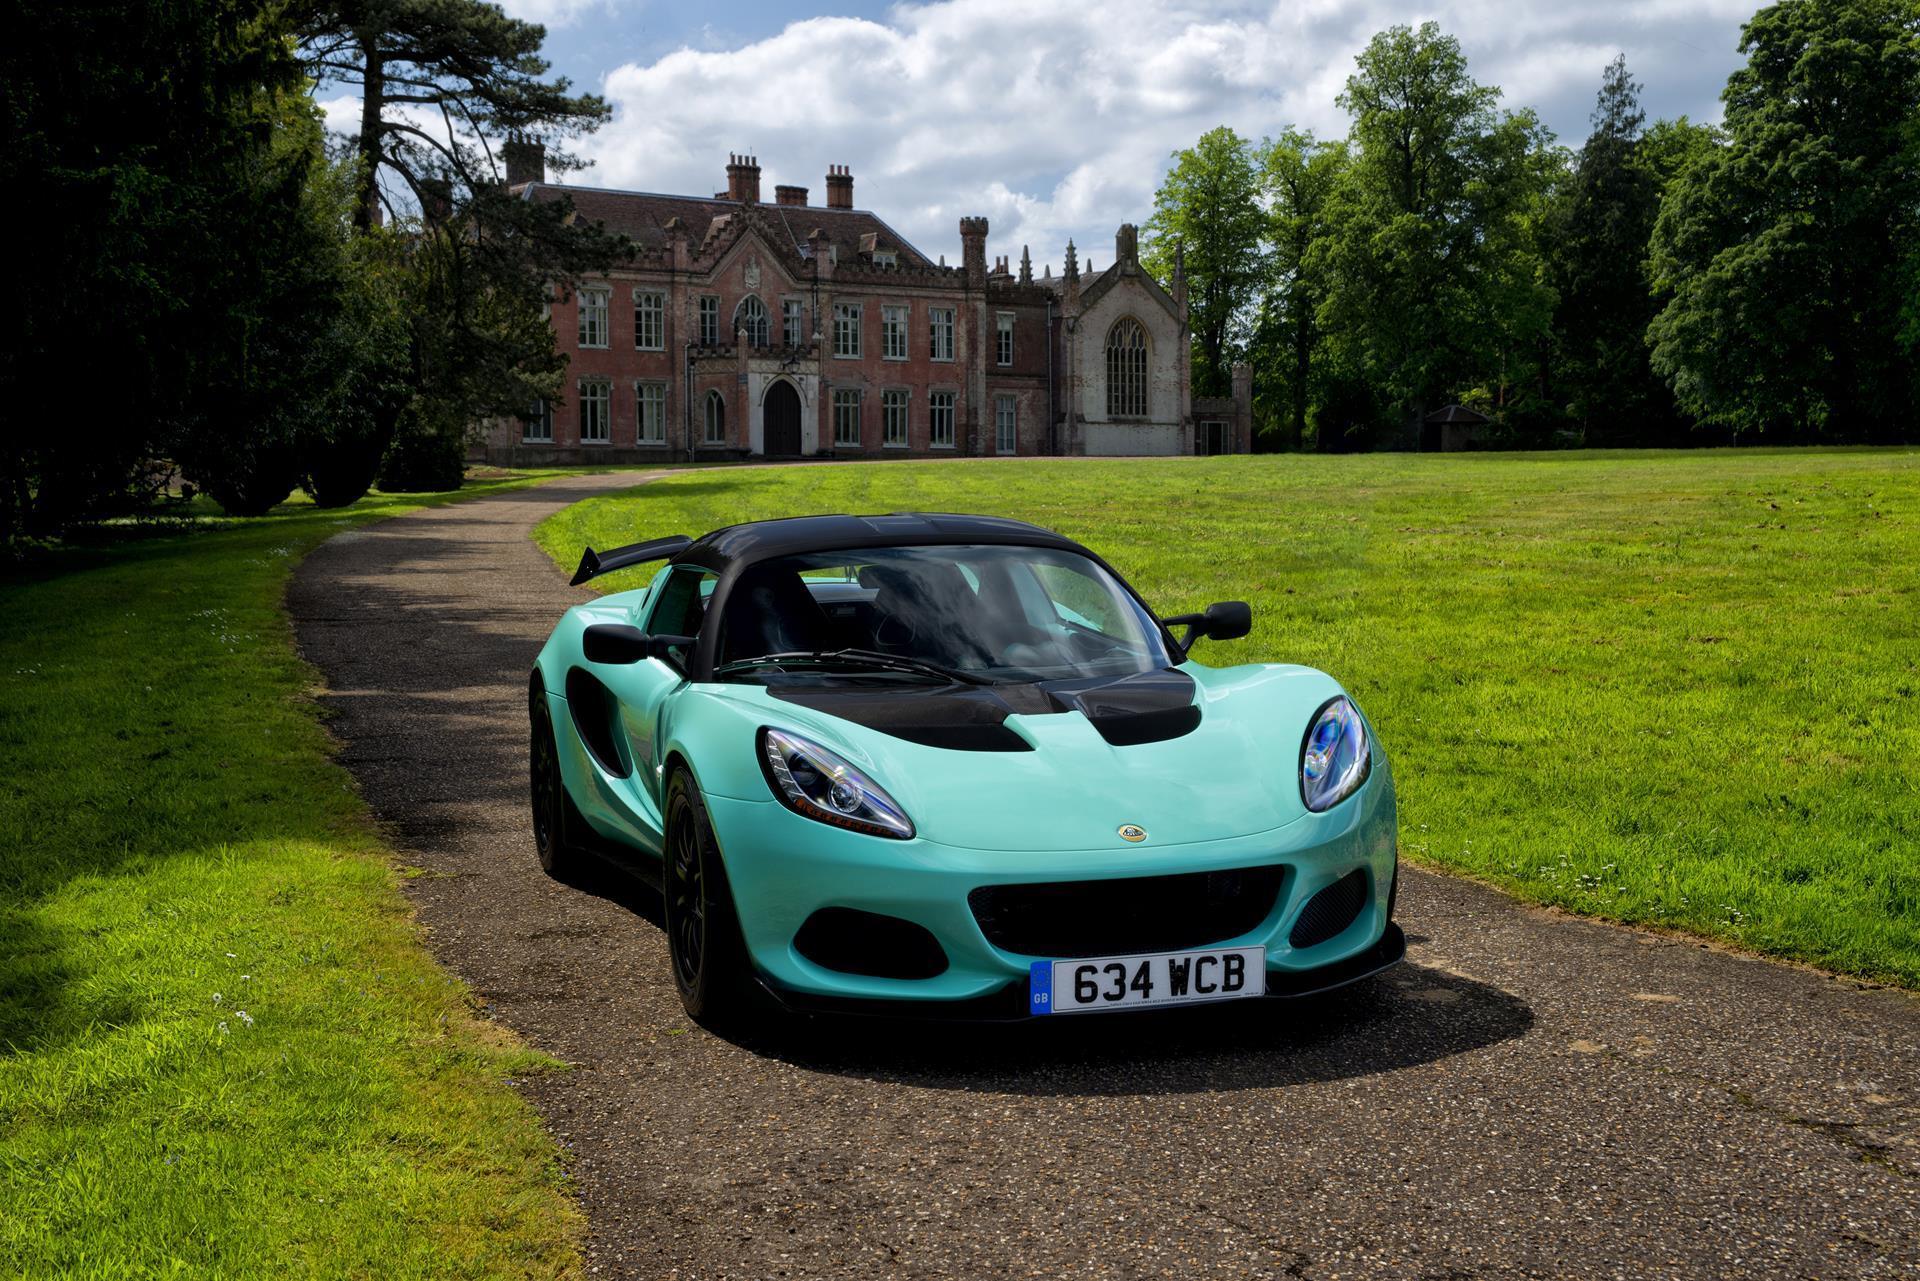 Lotus-Elise-Cup-250-2017-01 Mesmerizing Lotus Carlton for Sale 2015 Cars Trend